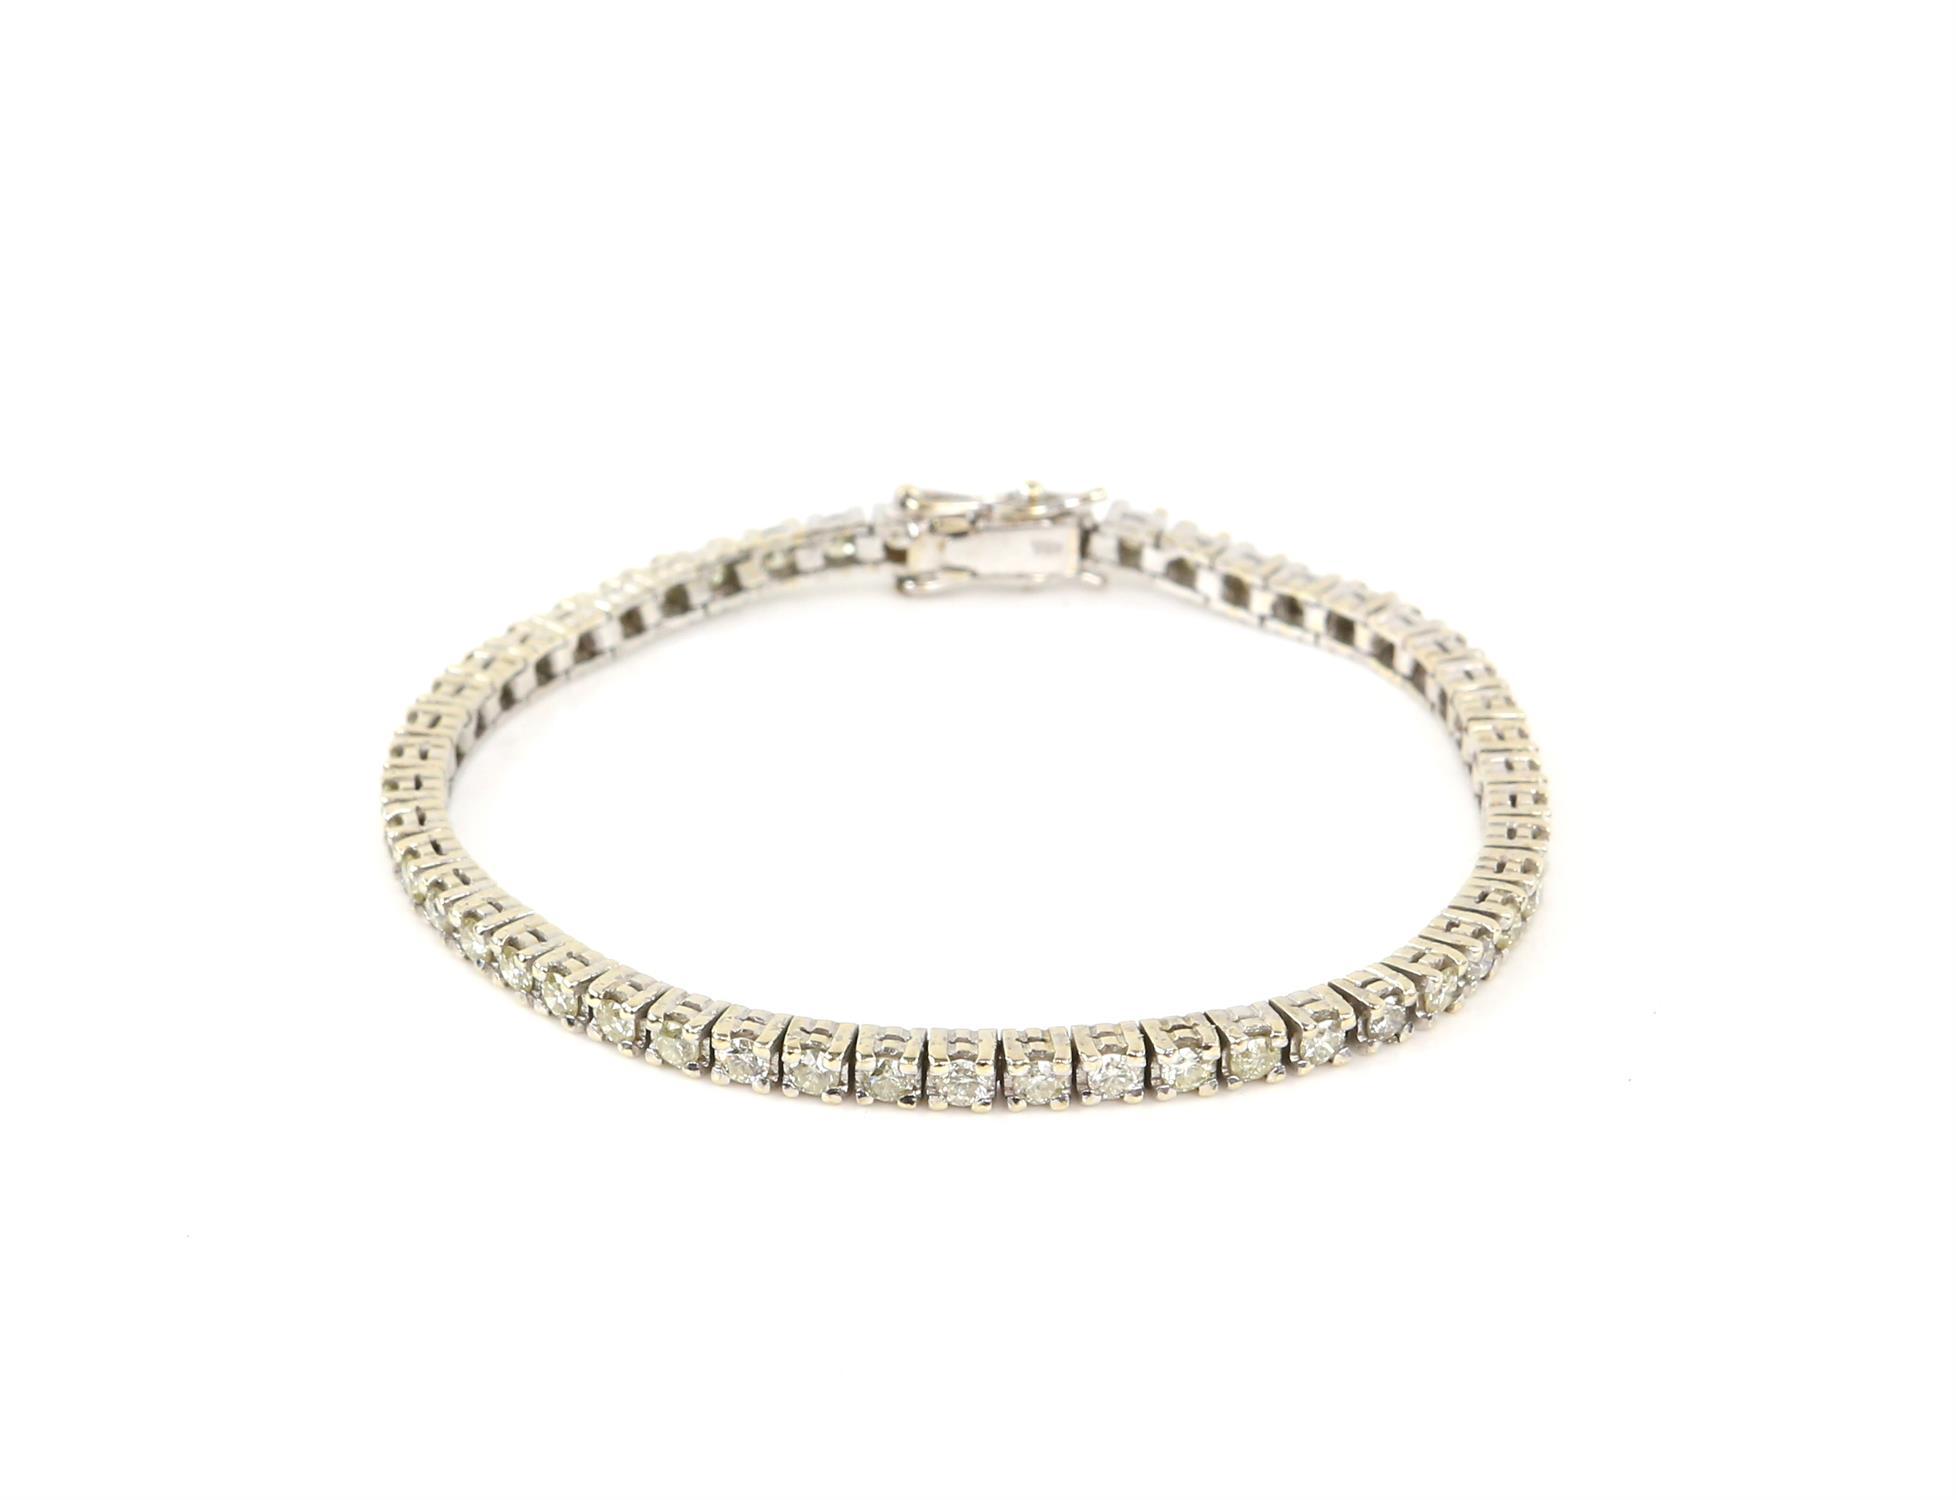 Diamond line bracelet, set with round brilliant cut diamonds, estimated total diamond weight 3.